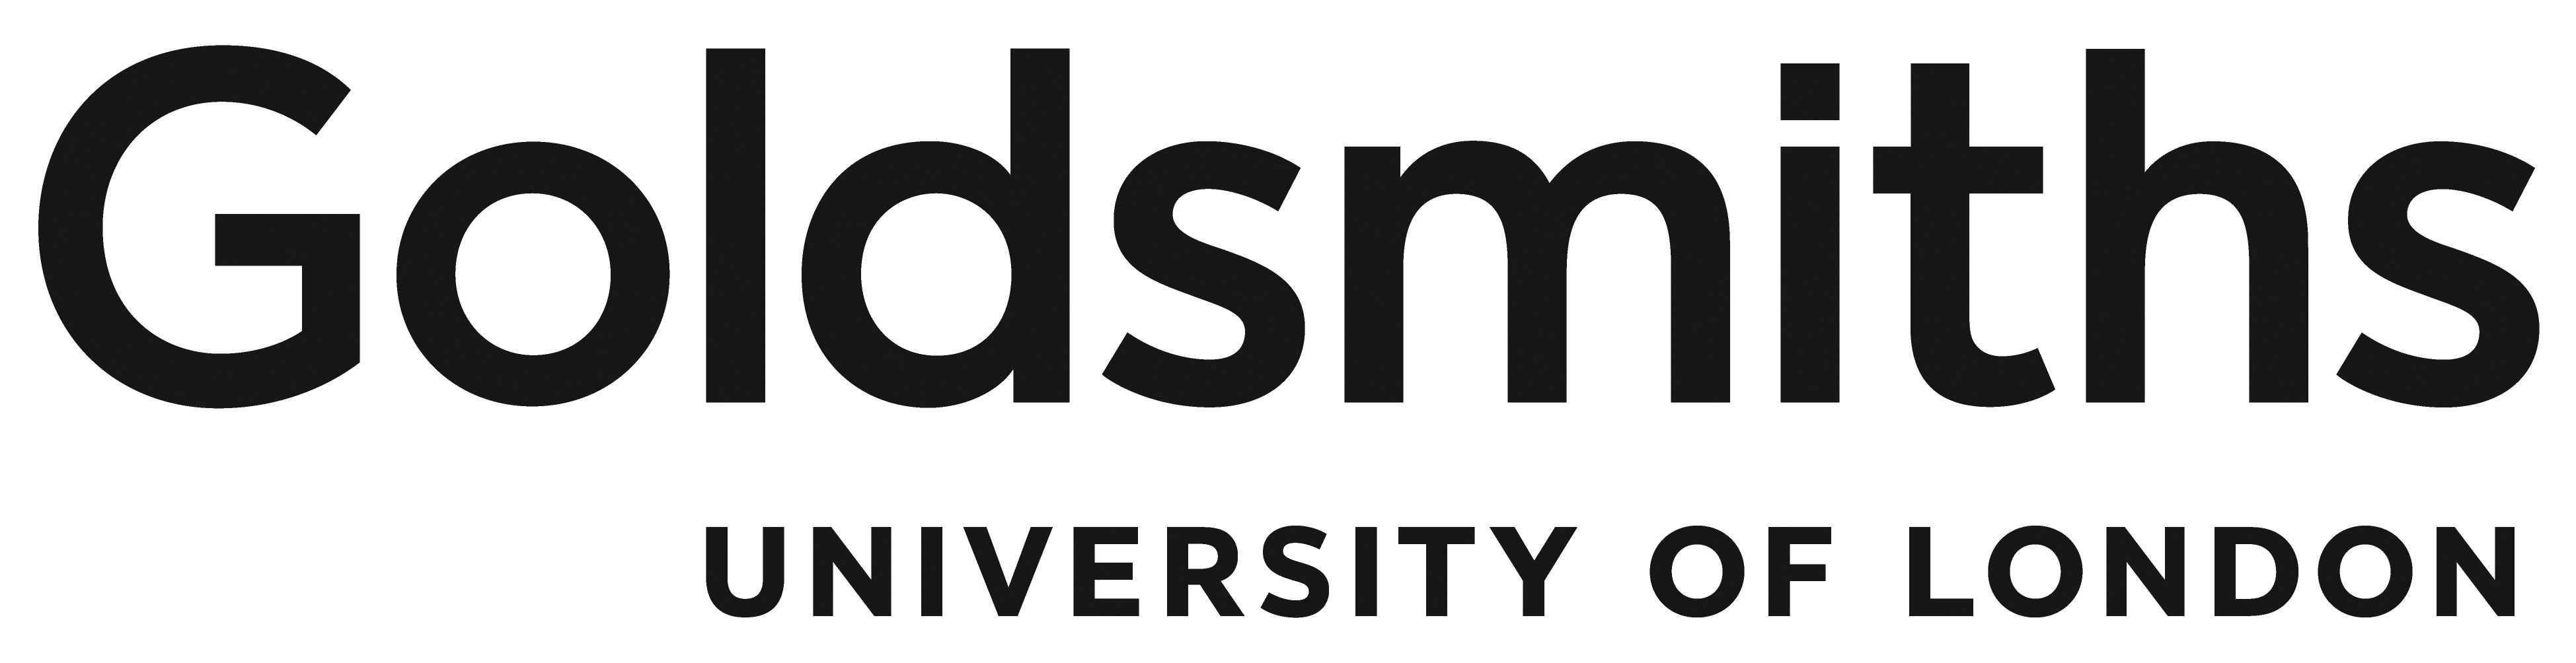 File:Goldsmiths-logo.JPG